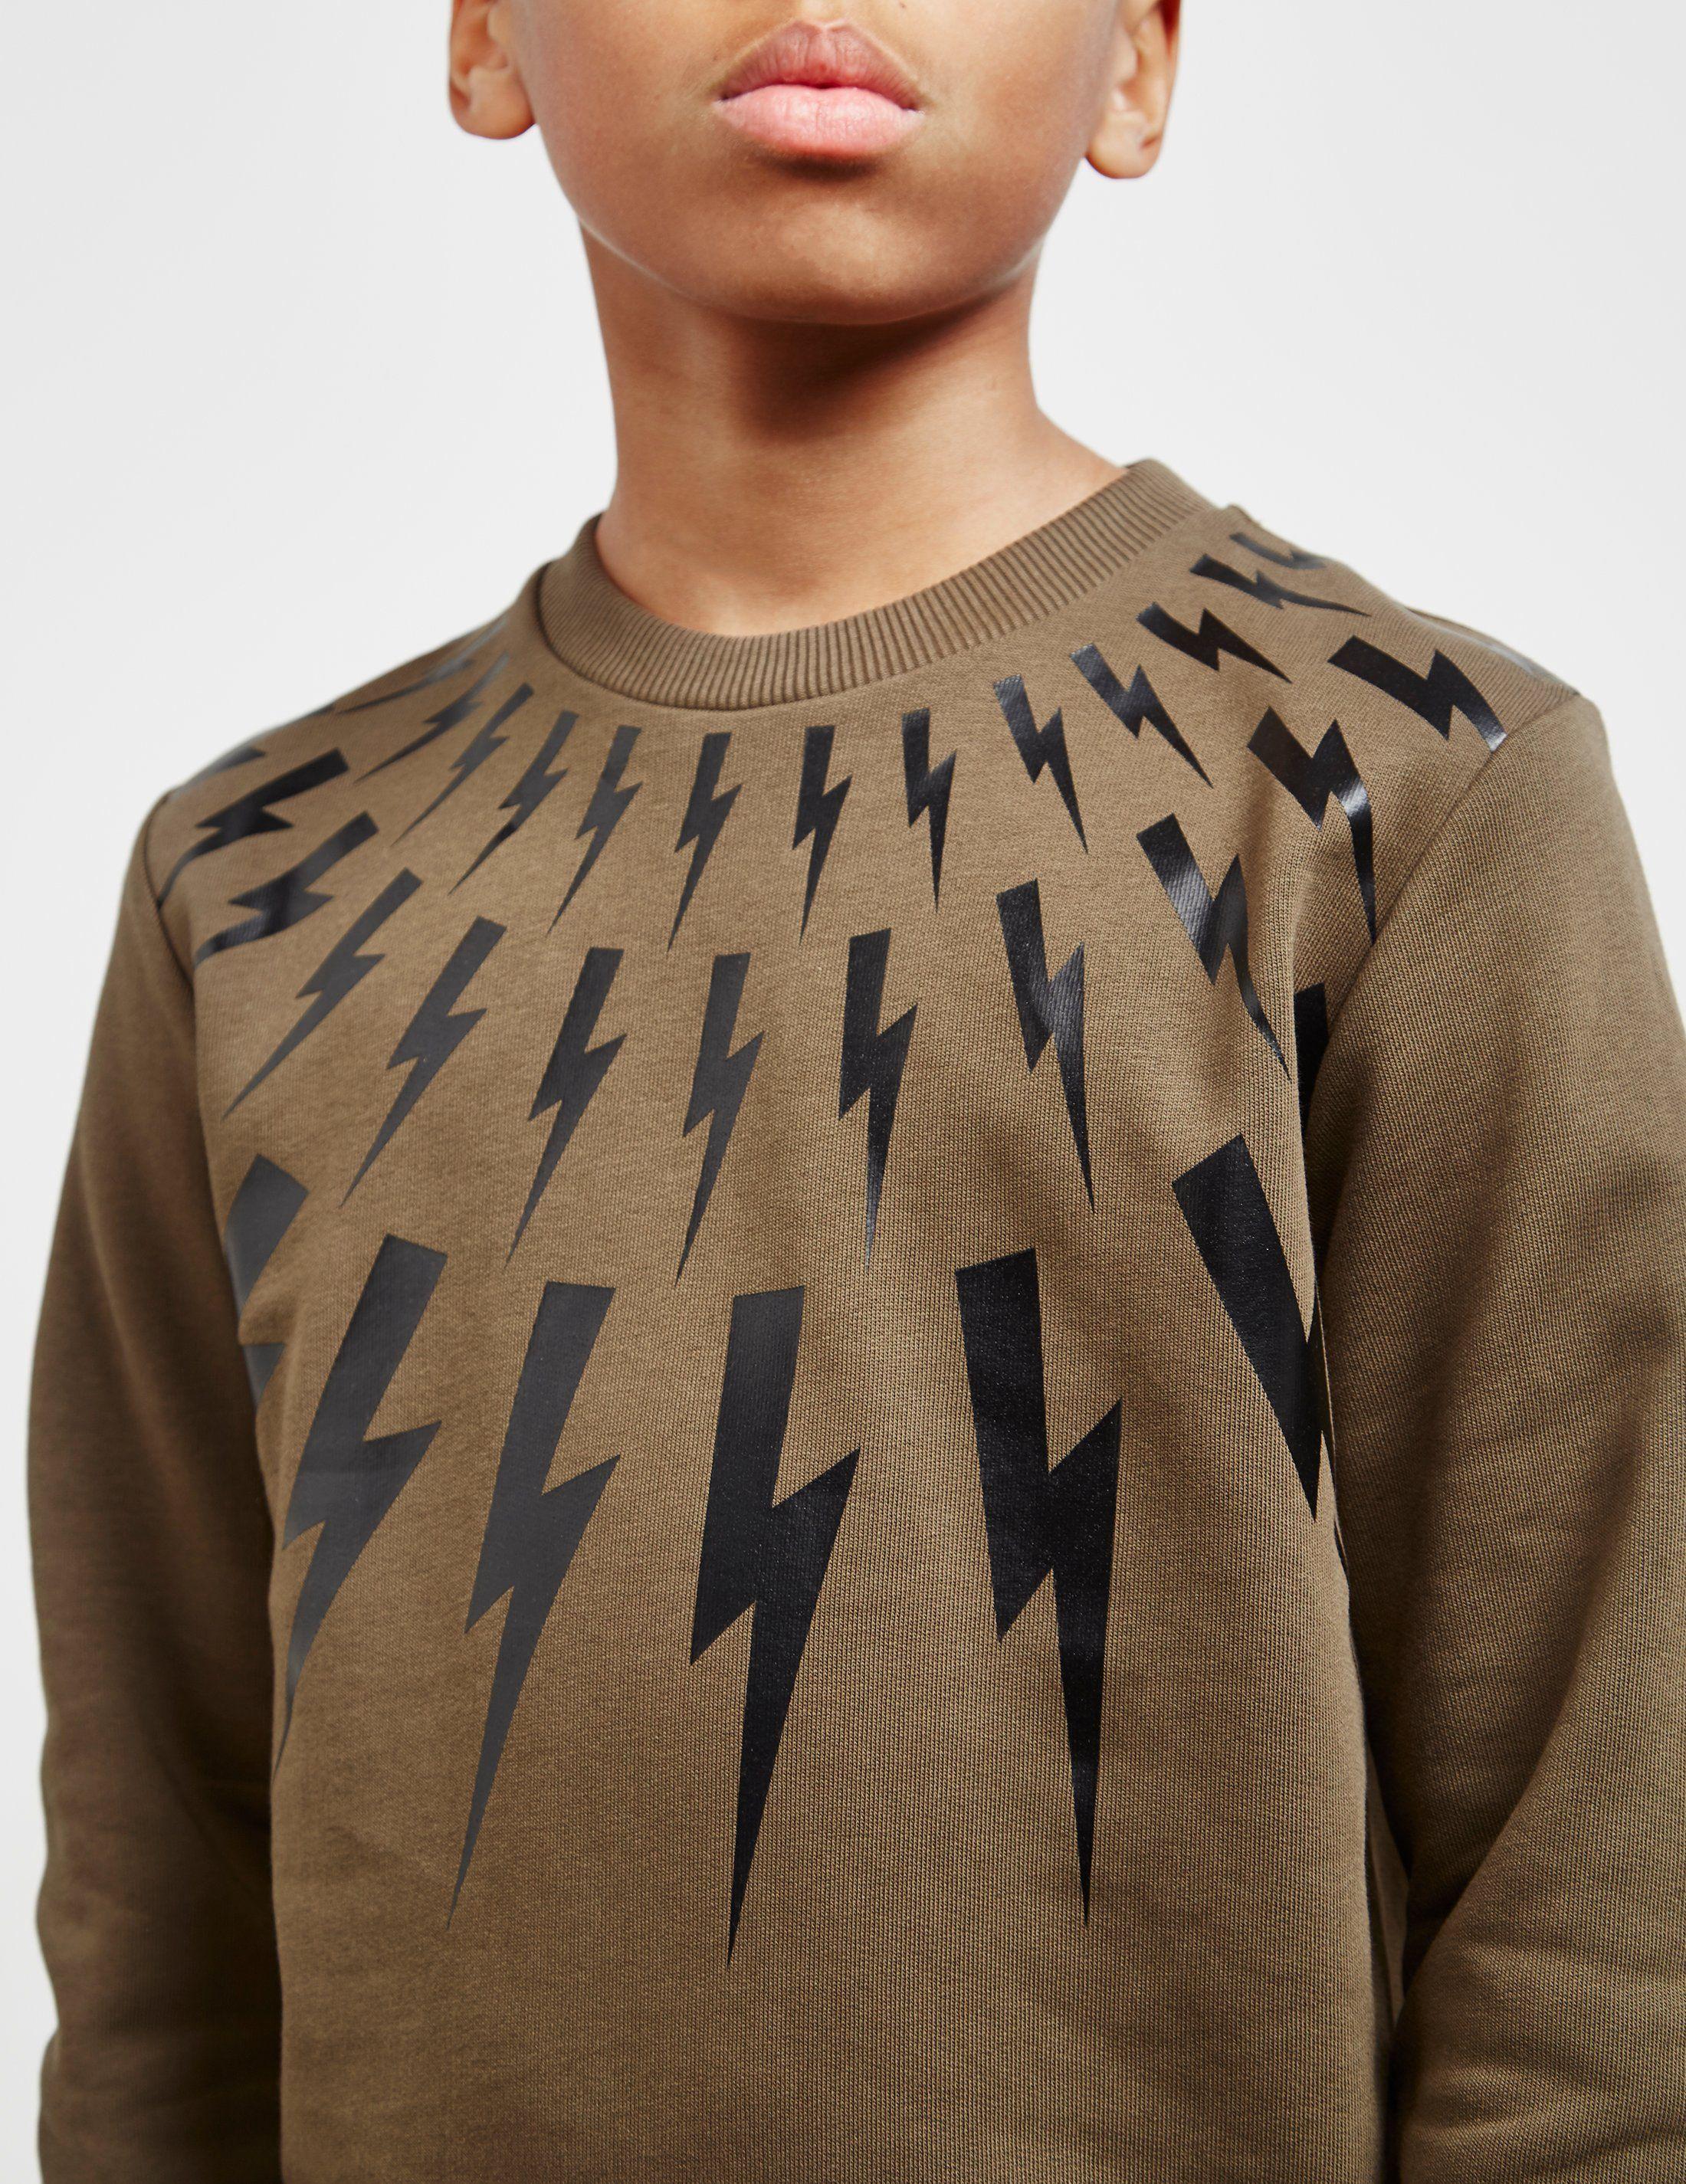 Neil Barrett Bolt Sweatshirt - Online Exclusive